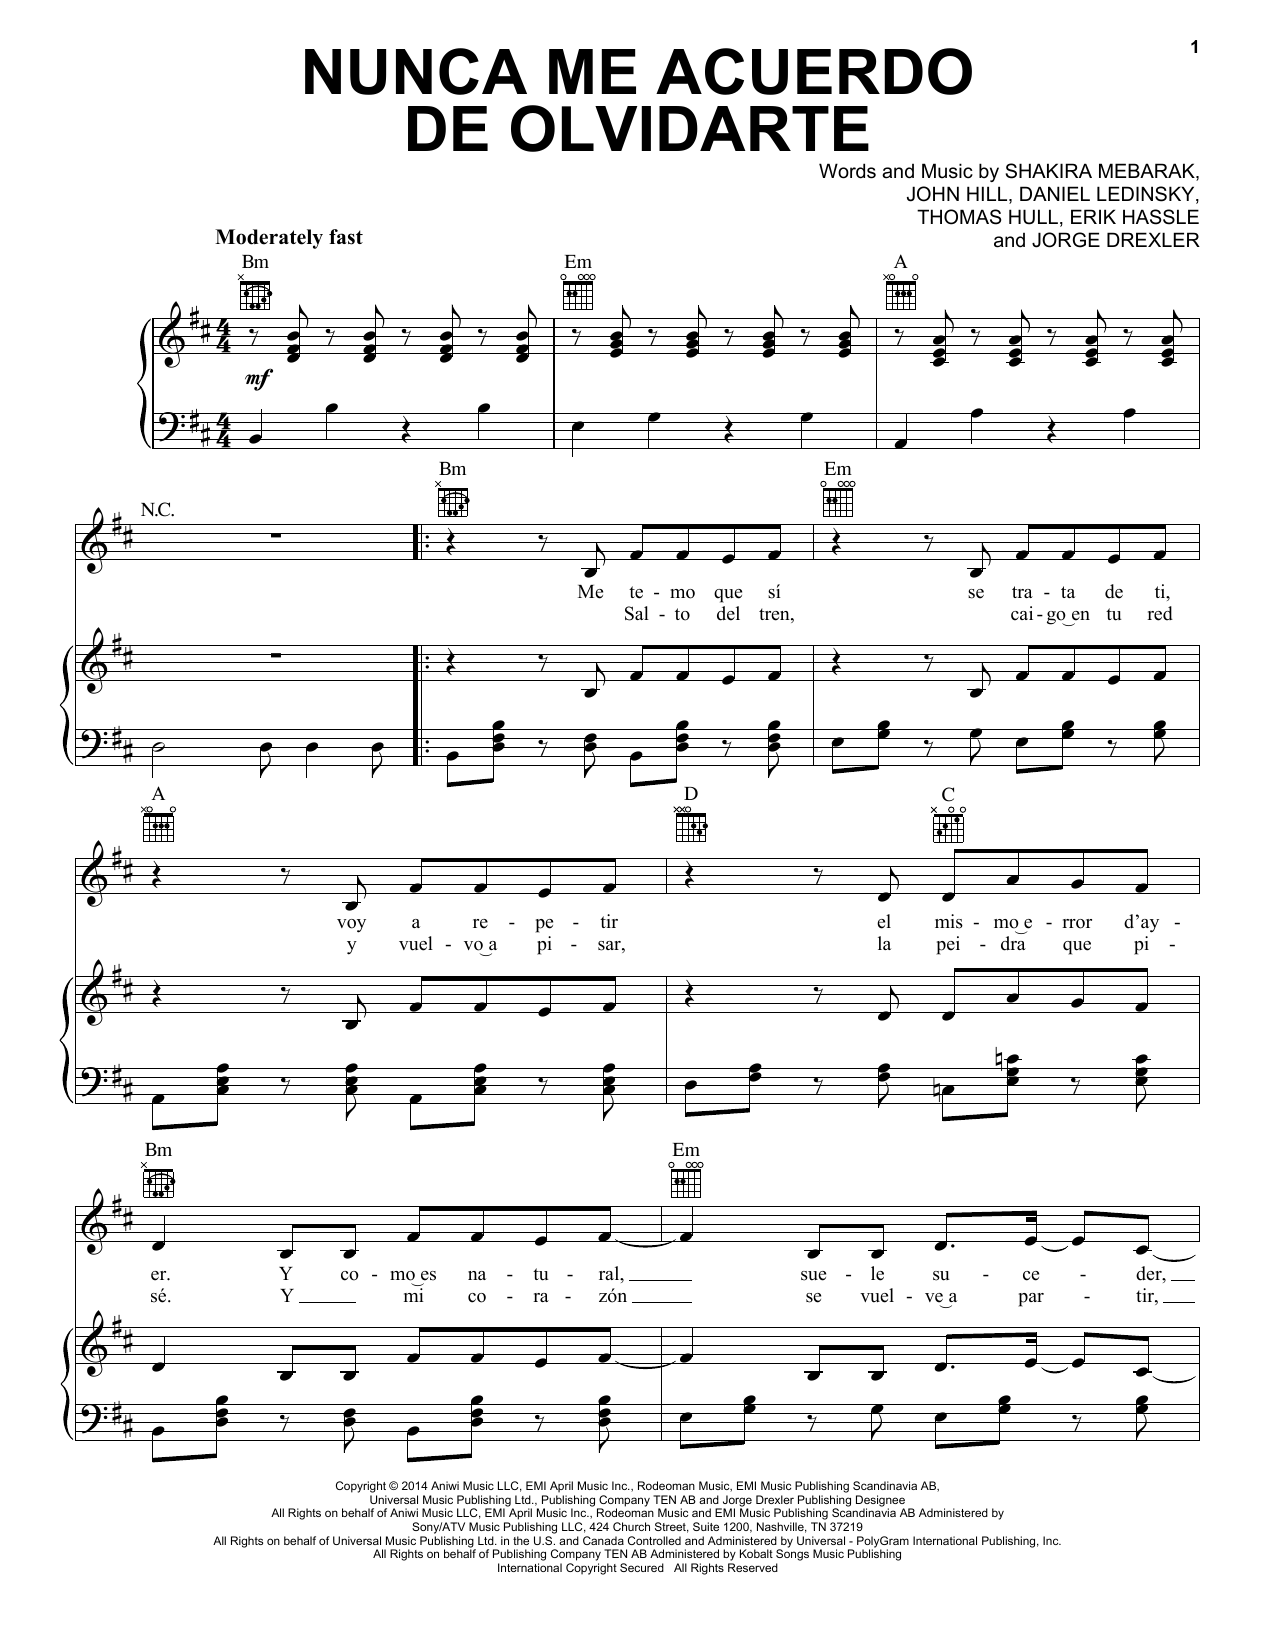 Nunca Me Acuerdo De Olvidarte (Piano, Vocal & Guitar (Right-Hand Melody))